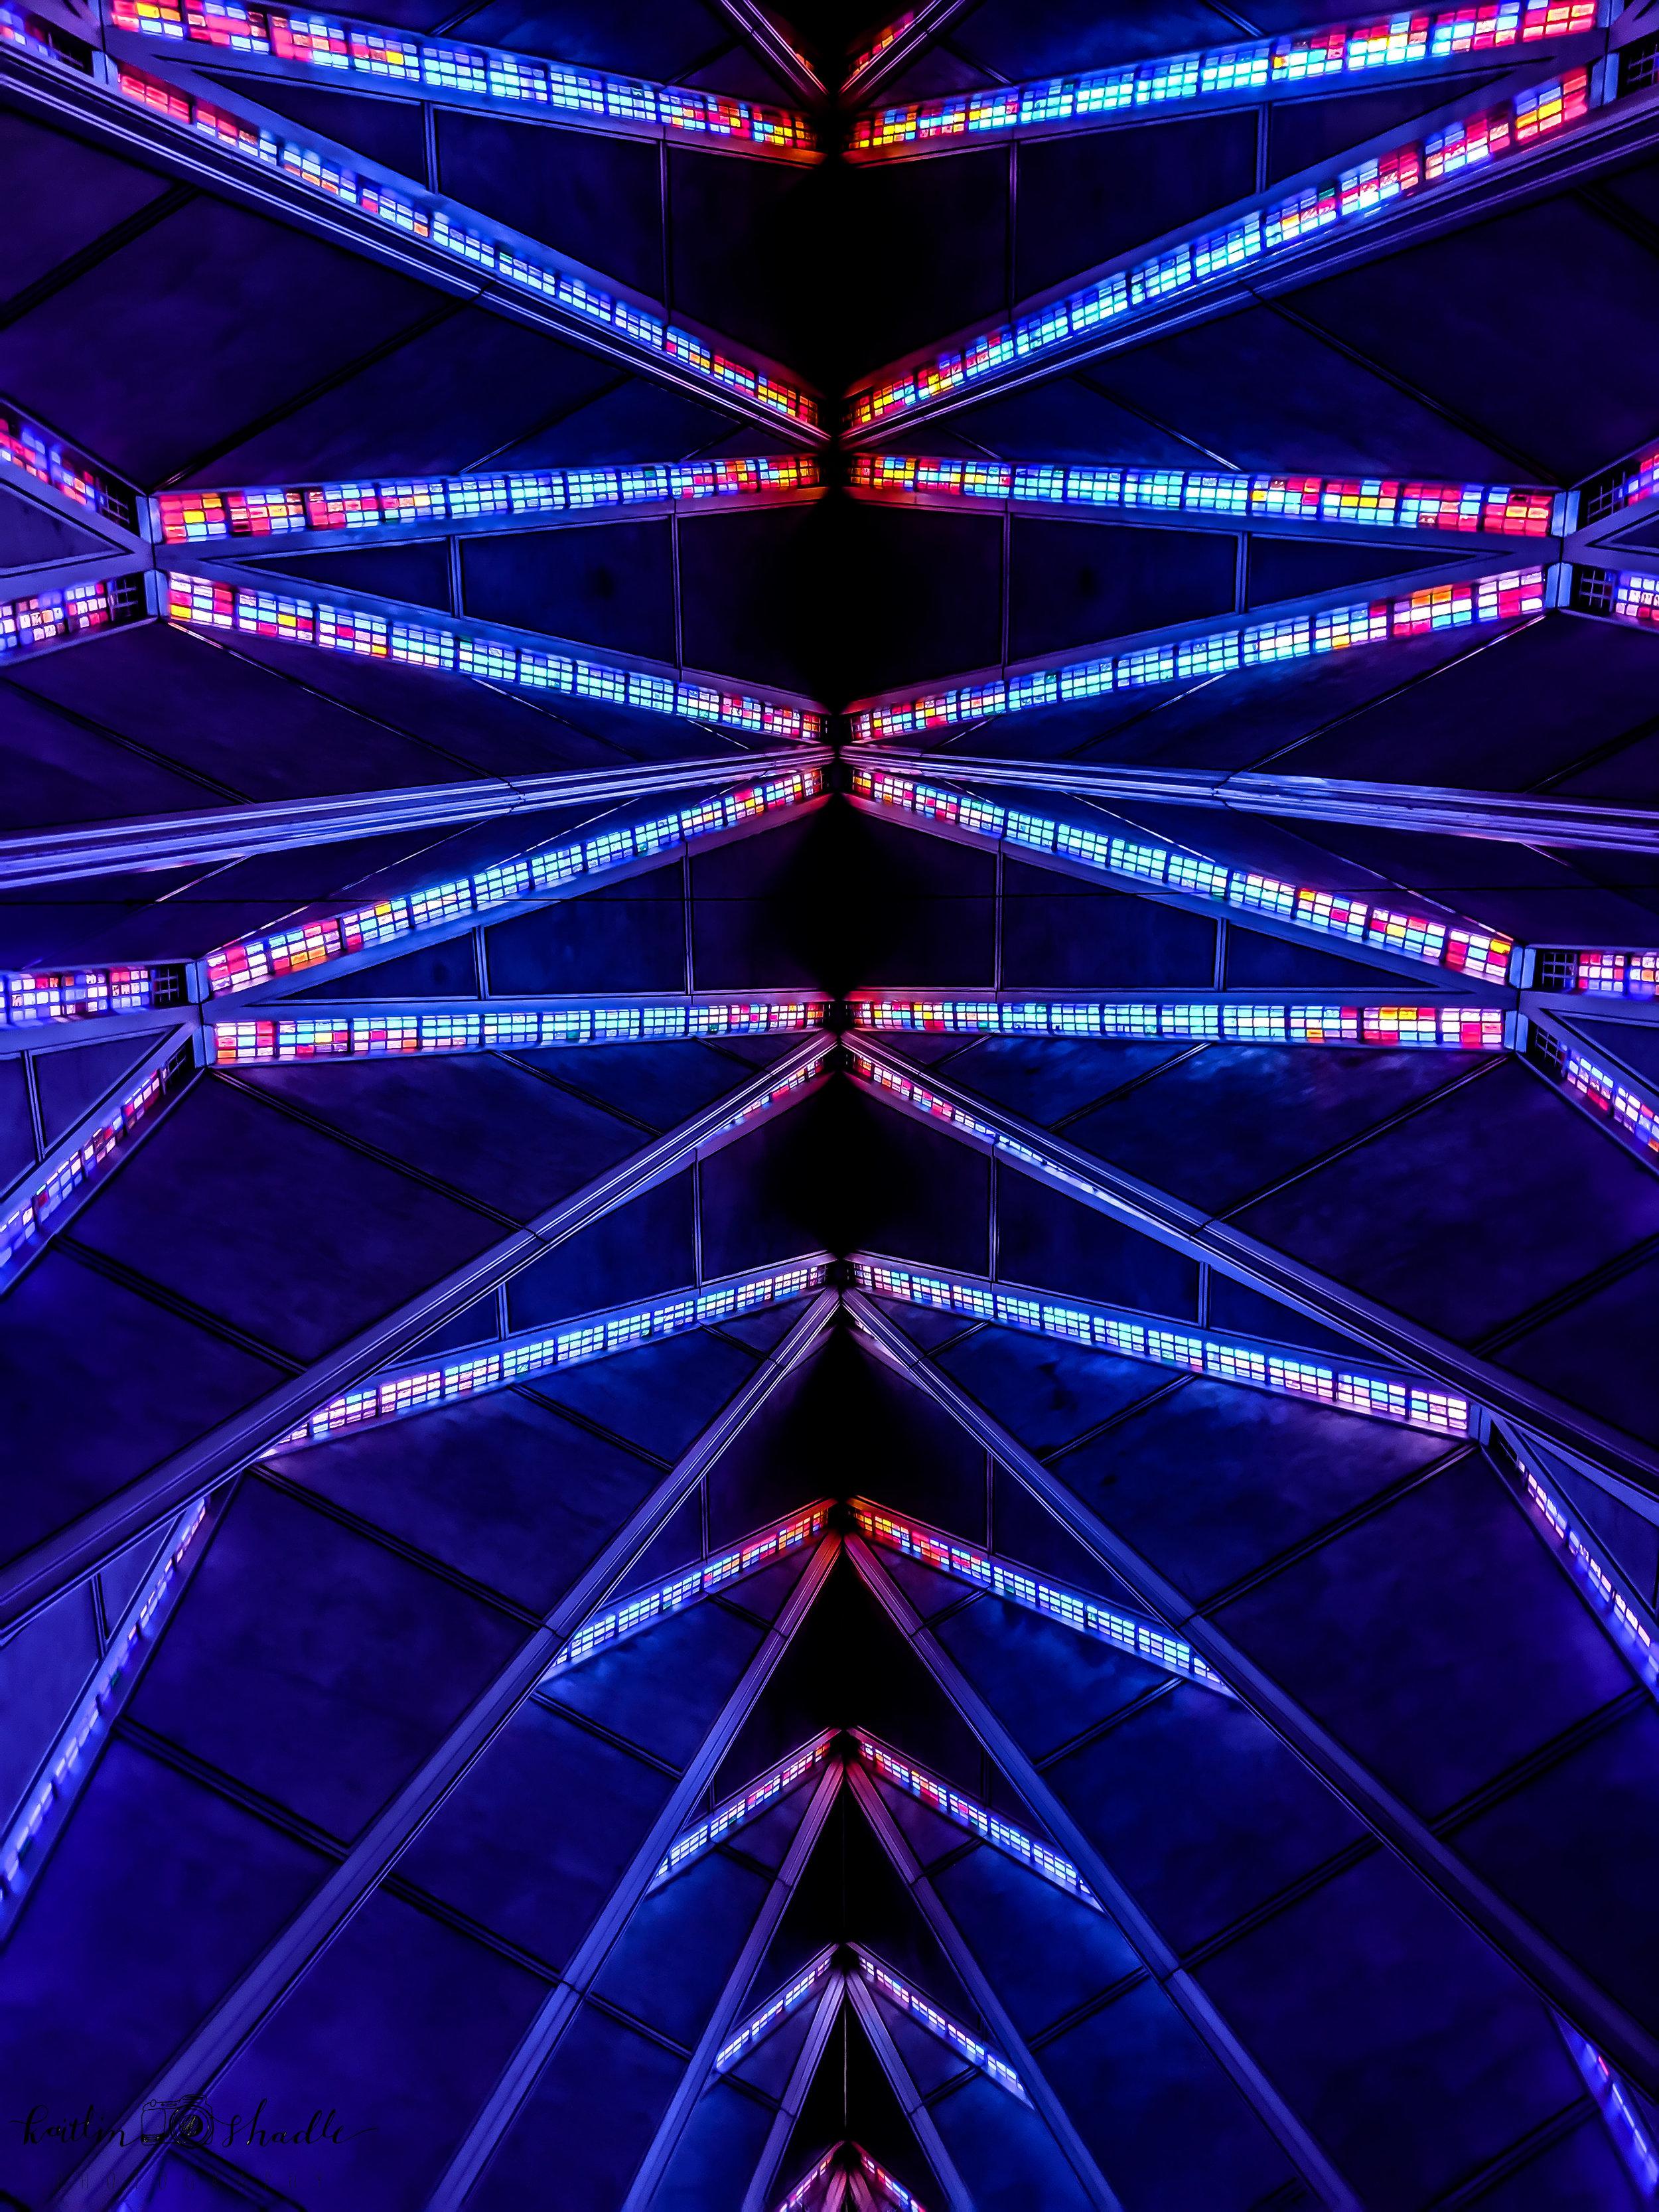 Kaleidoscope Ceiling